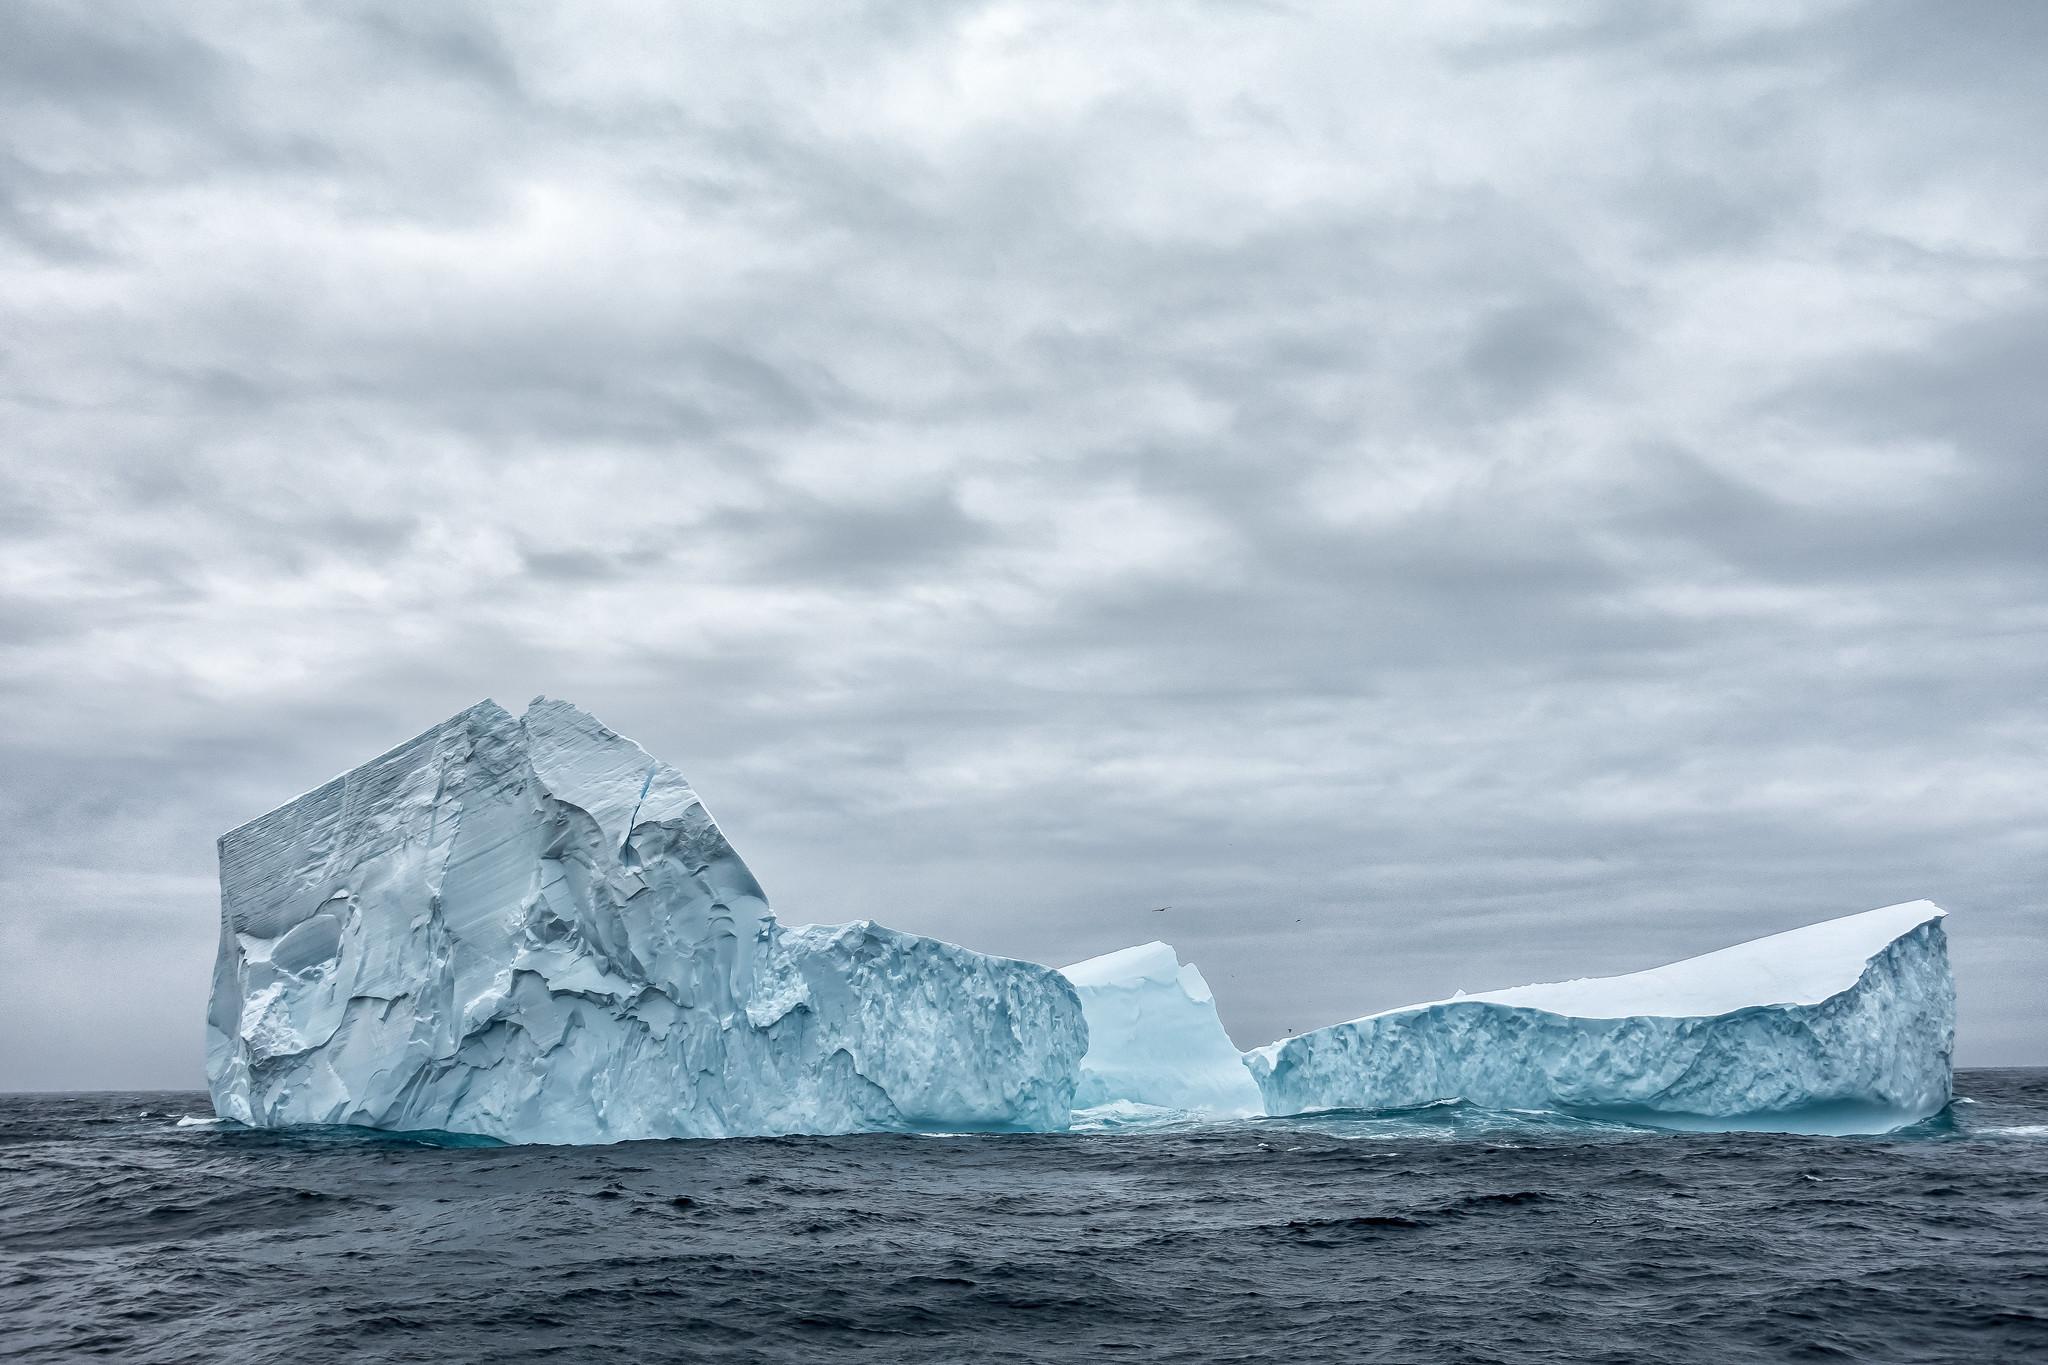 Antarctic Ocean iceberg (Photo: Kyle Mortara via Flickr Creative Commons)